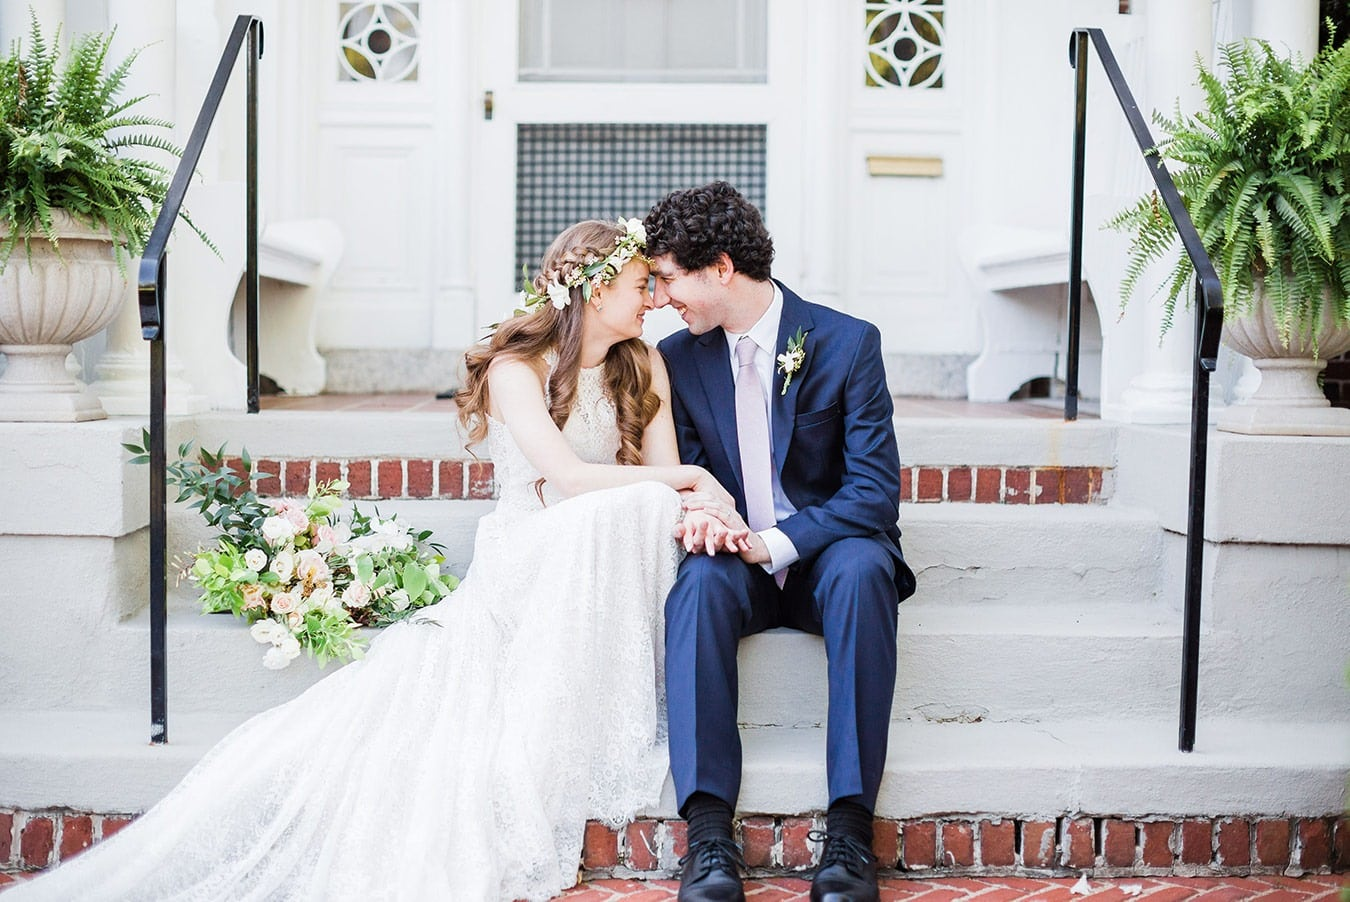 kaitlyn-couple-momentclose